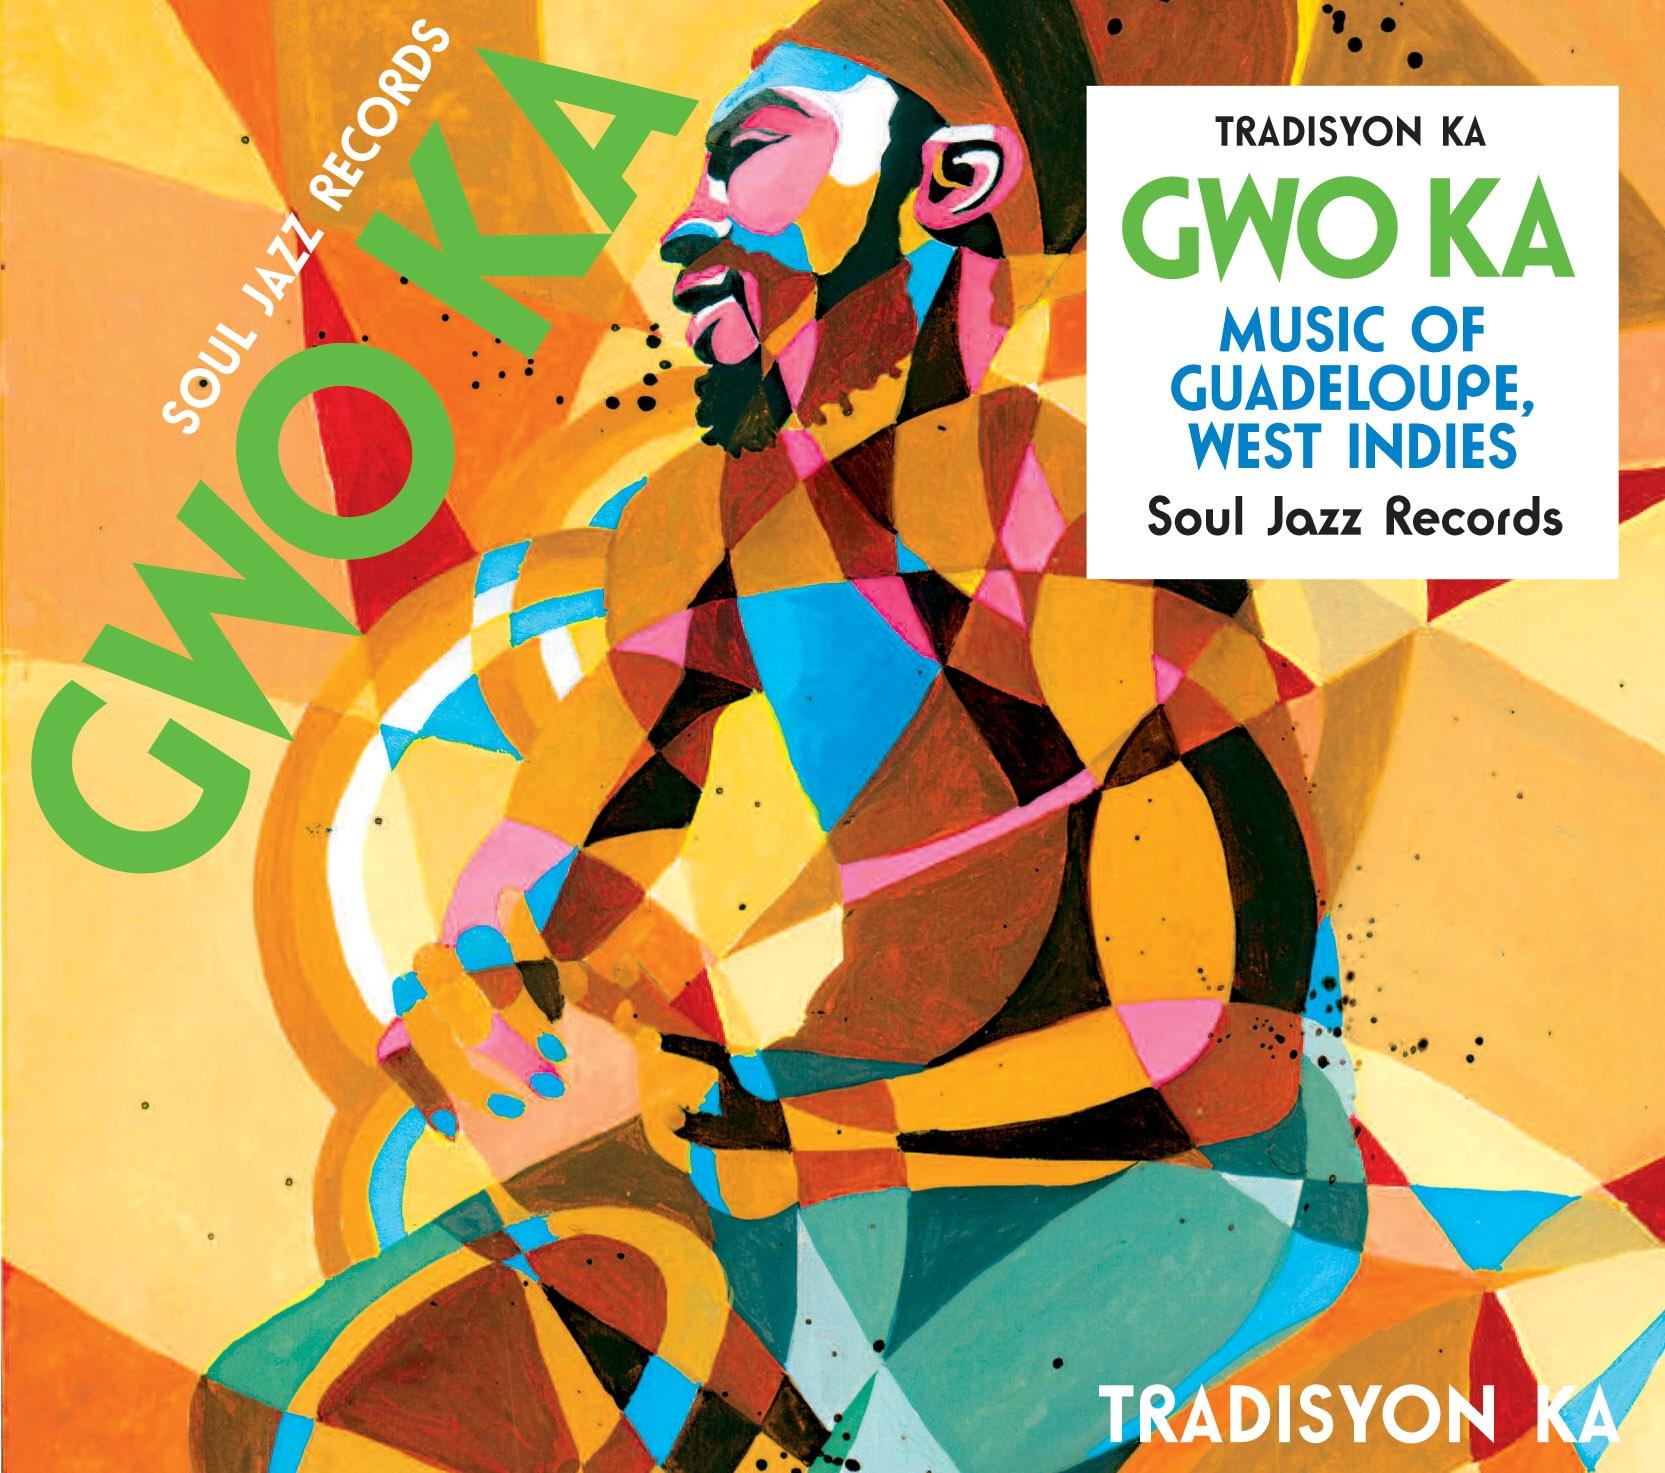 MusicTradisyon Ka - Gwo Ka Music of Guadeloupe, West Indies (2014)